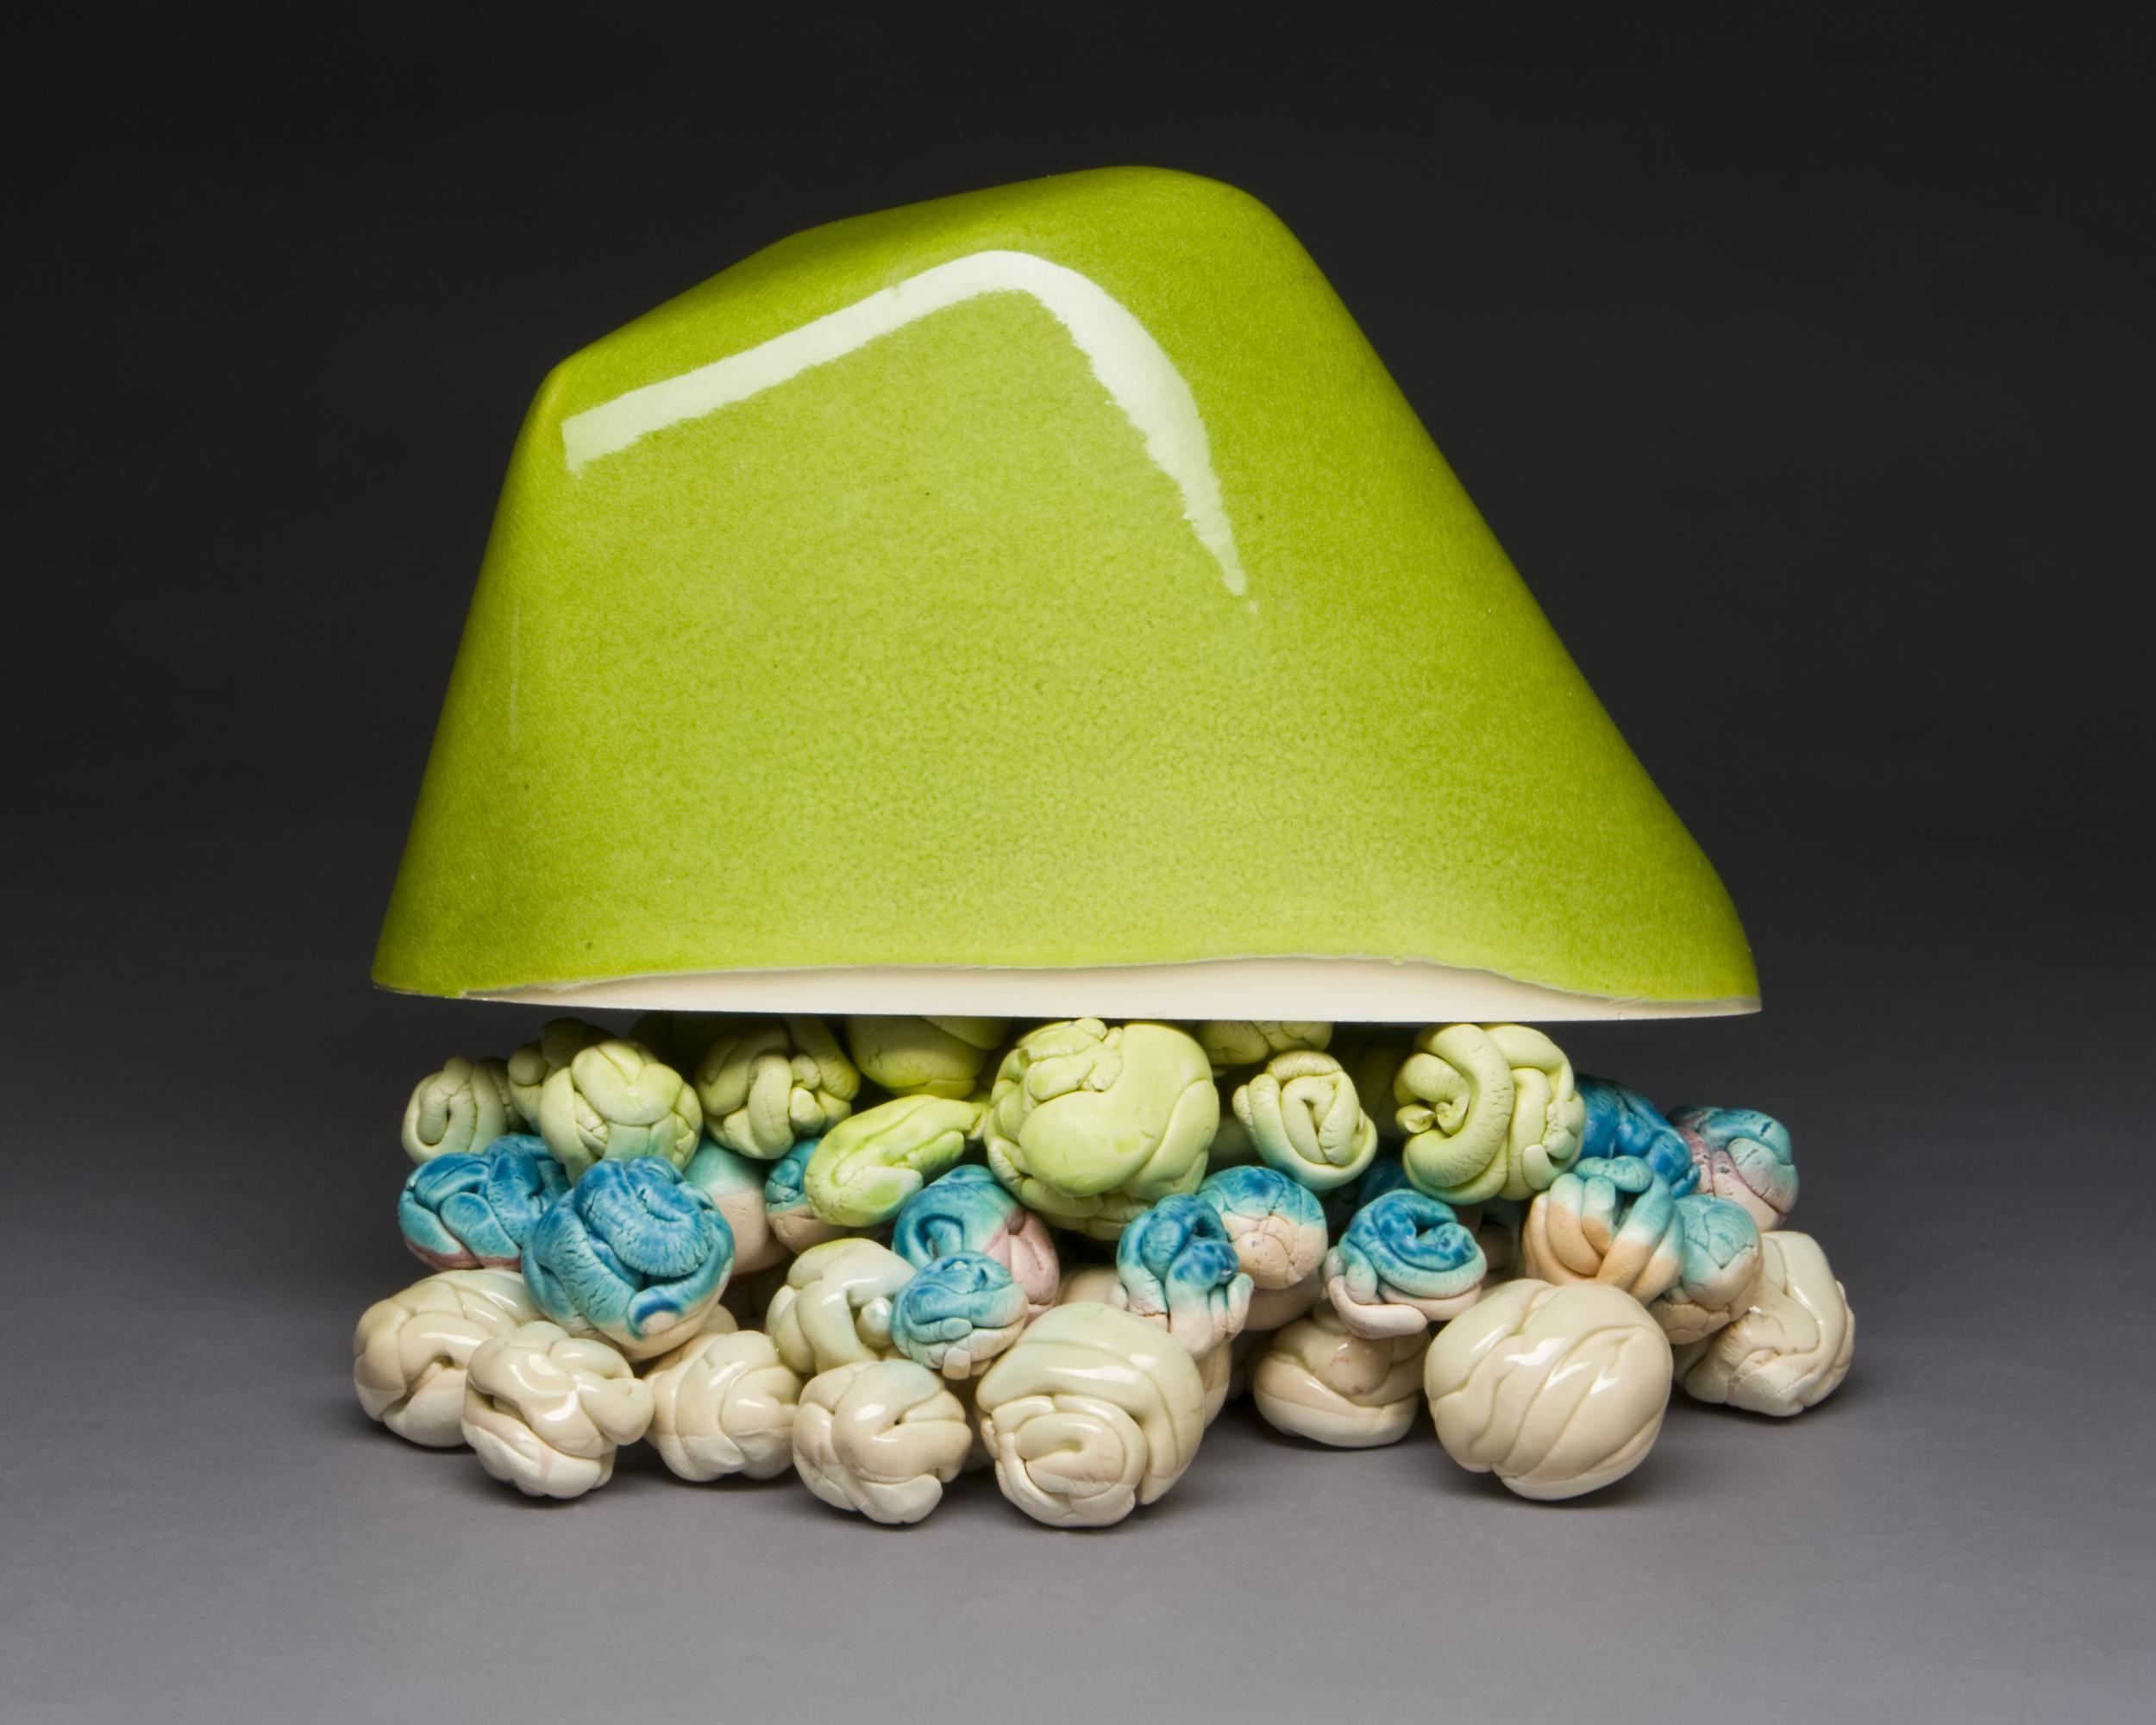 "Sweetsscape Component #3  Porcelain, glass, plaster, stain, wood, MDF, paint, epoxy, pins 12"" x 14"" x 5"" 2011 Photo Credit: Photo Credit: Jim Walker"